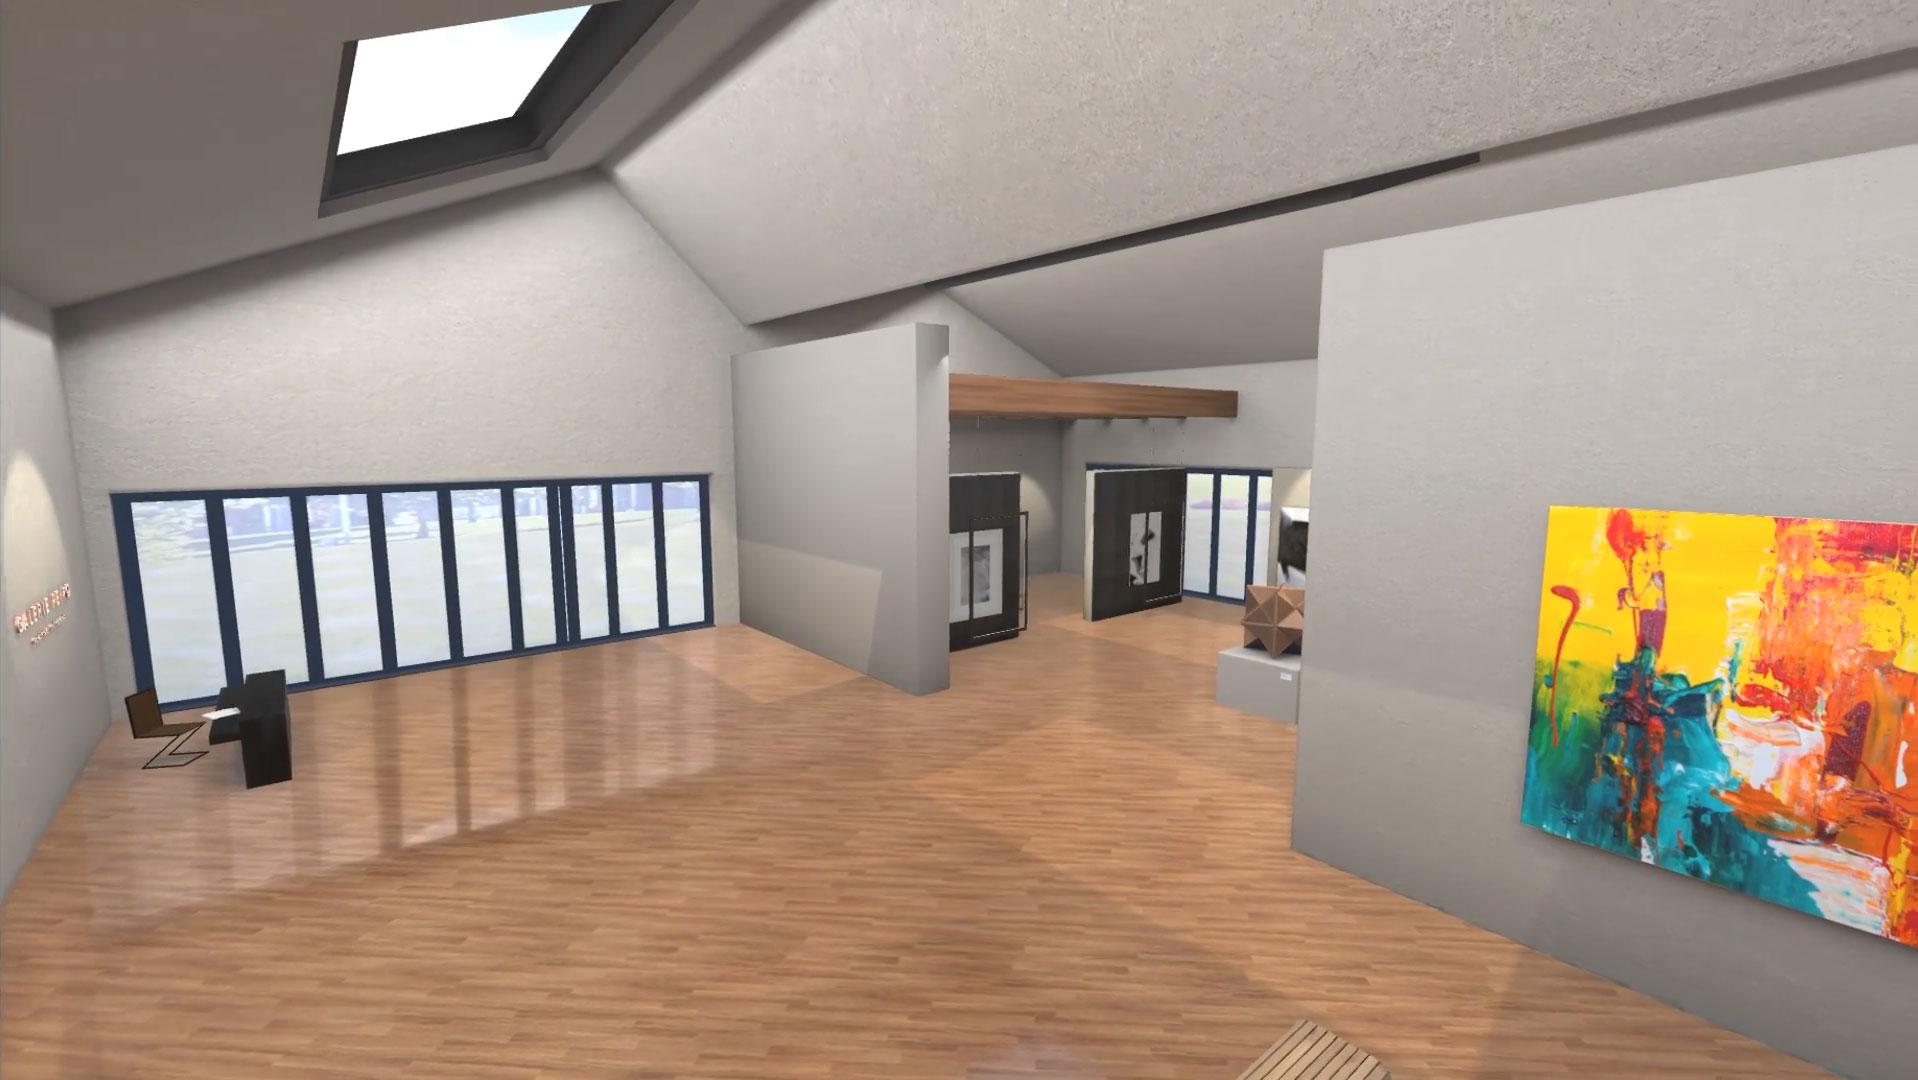 virtual art gallery 3d